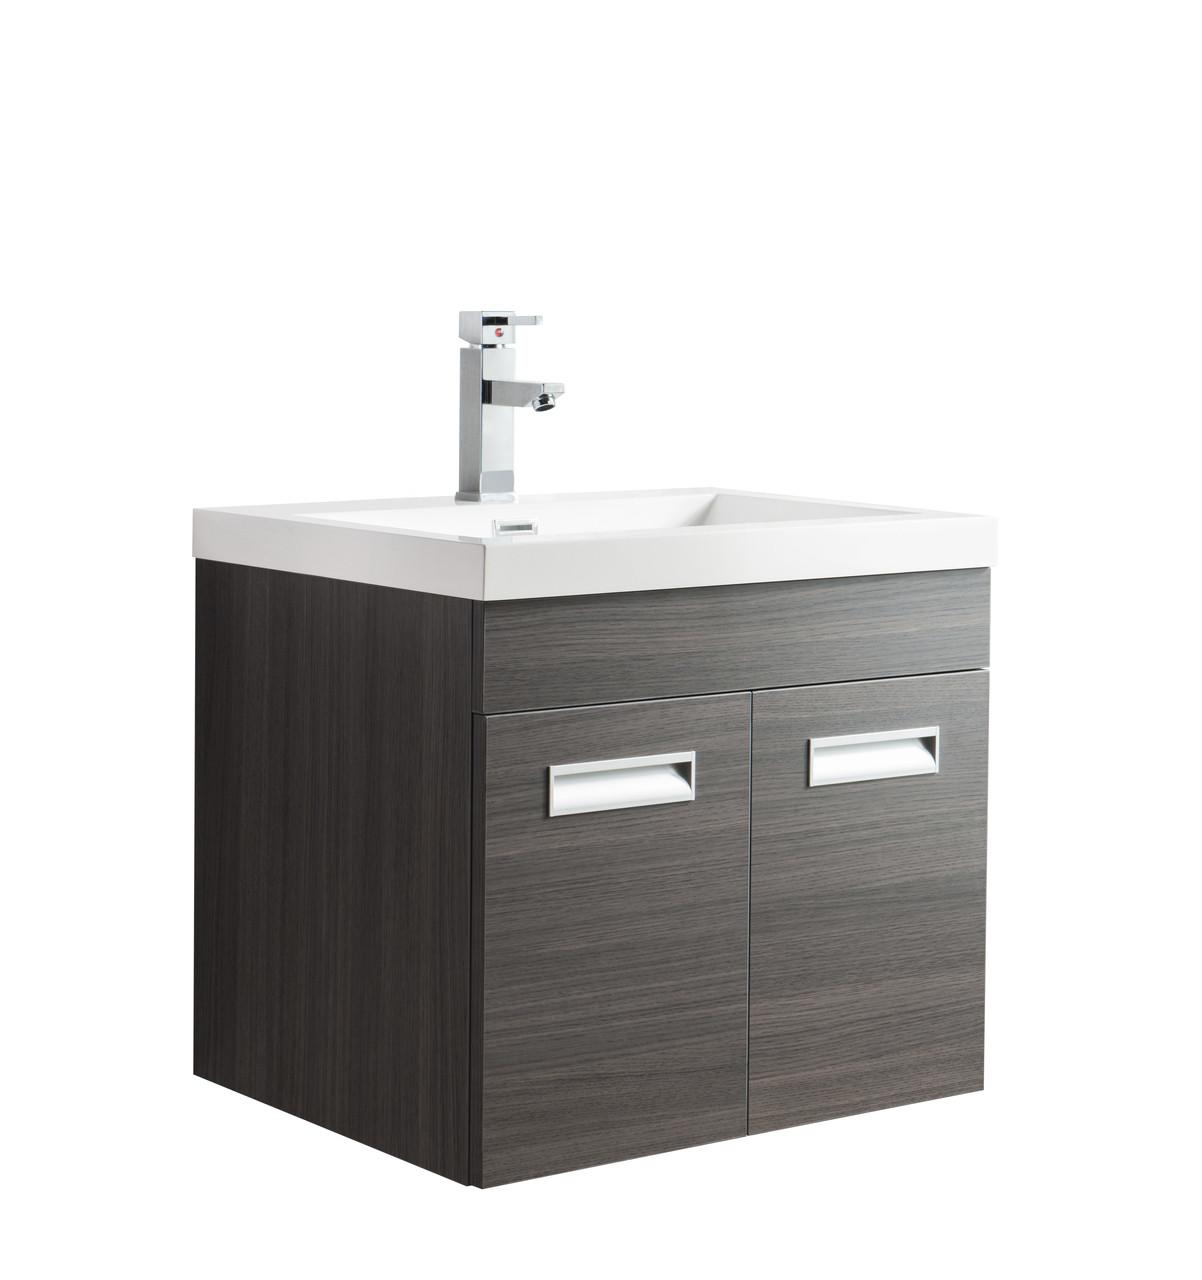 Alma 24 Grey Oak Wall Hung Modern Bathroom Vanity